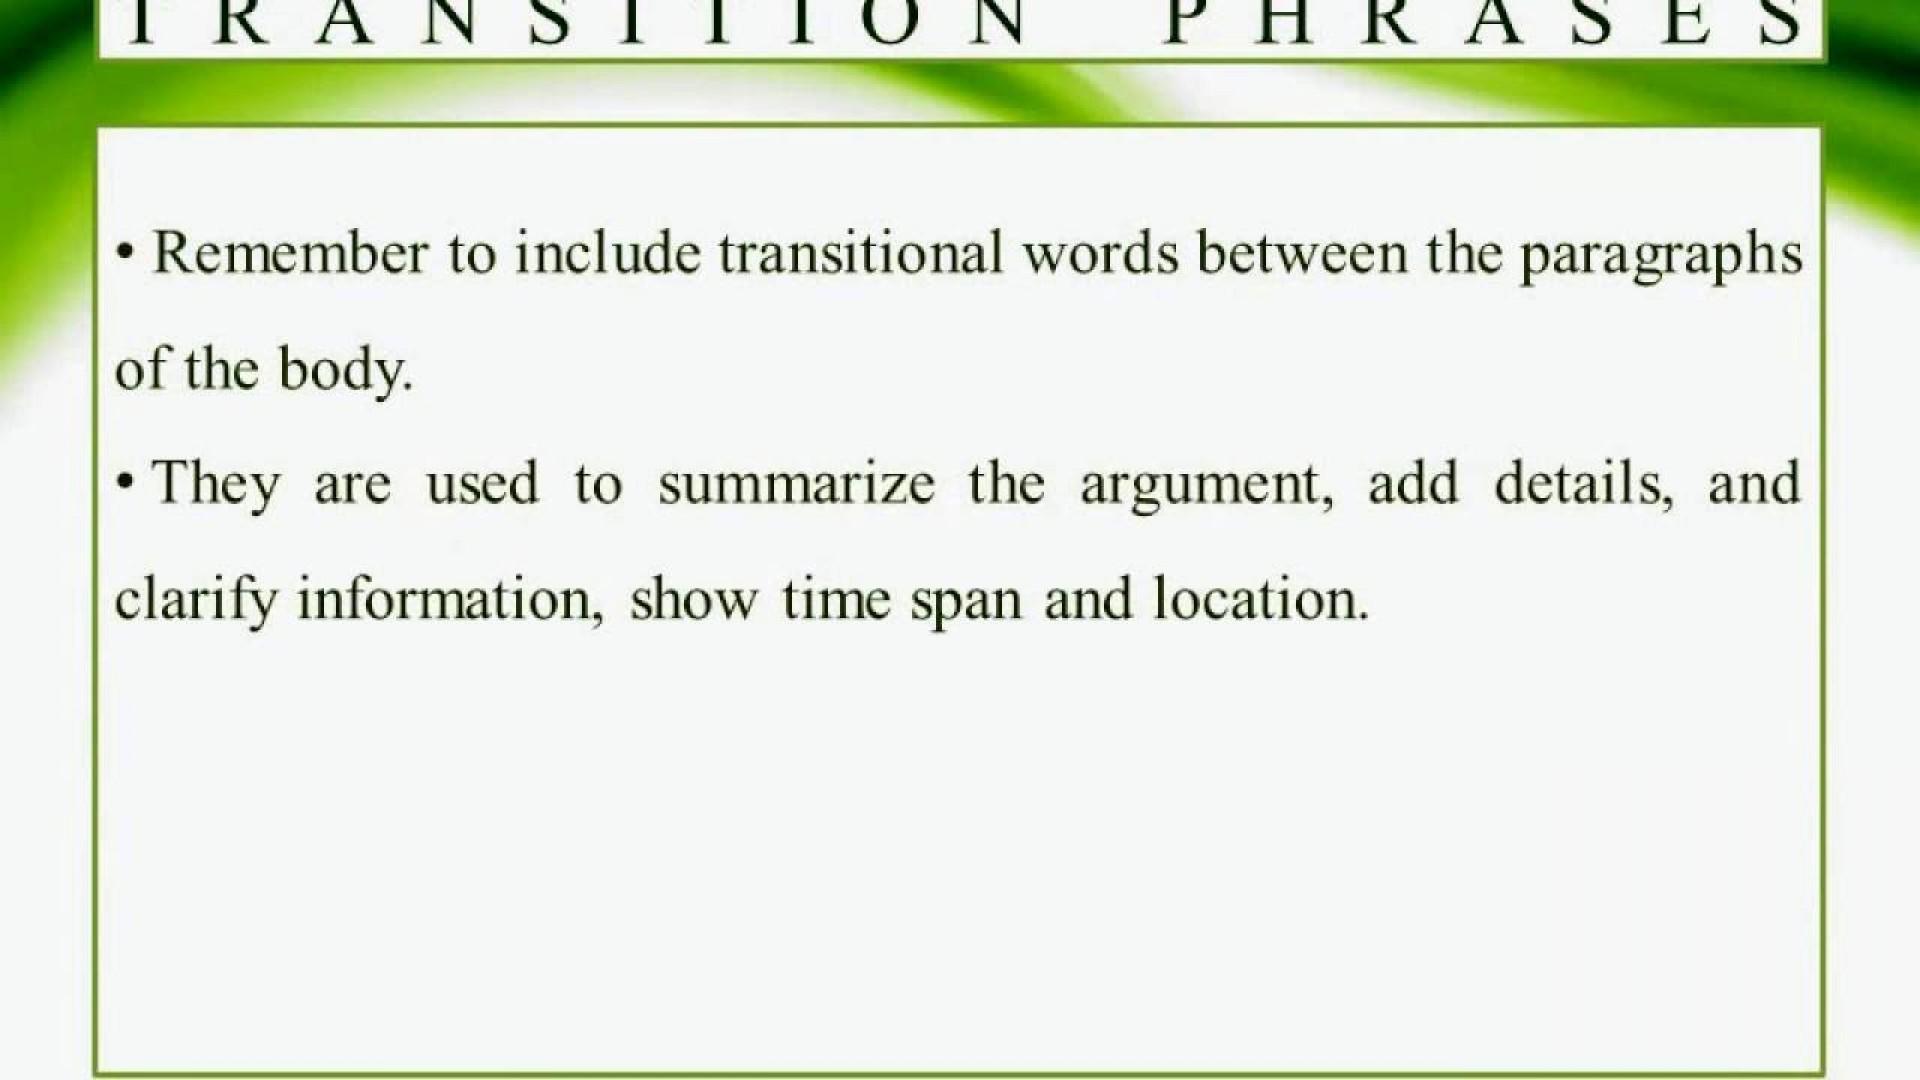 008 Essay Example Nature Vs Nurture Incredible Paper Outline Topics 1920